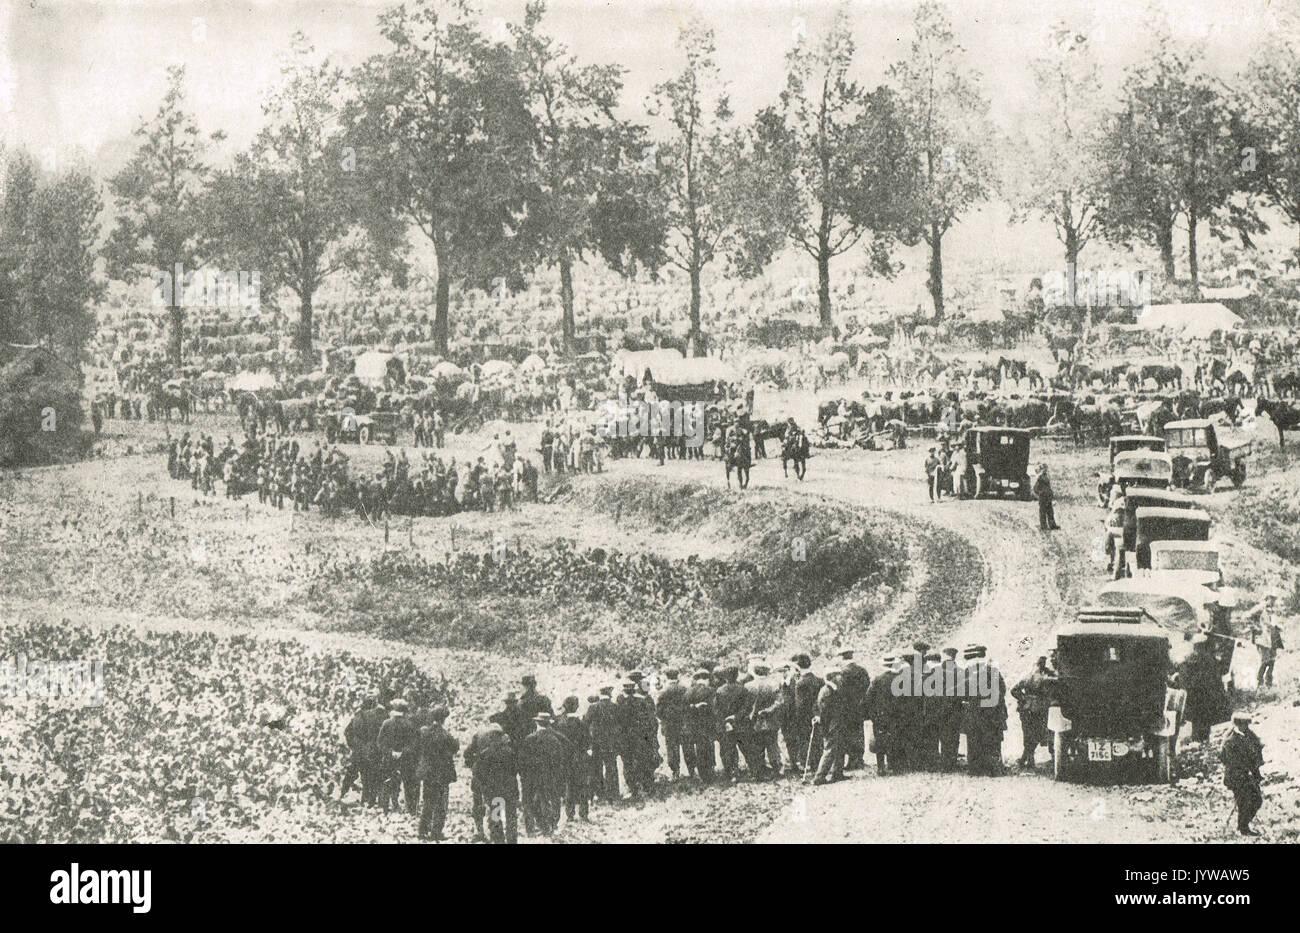 Massed  German Army in Belgium 1914, WW1 - Stock Image